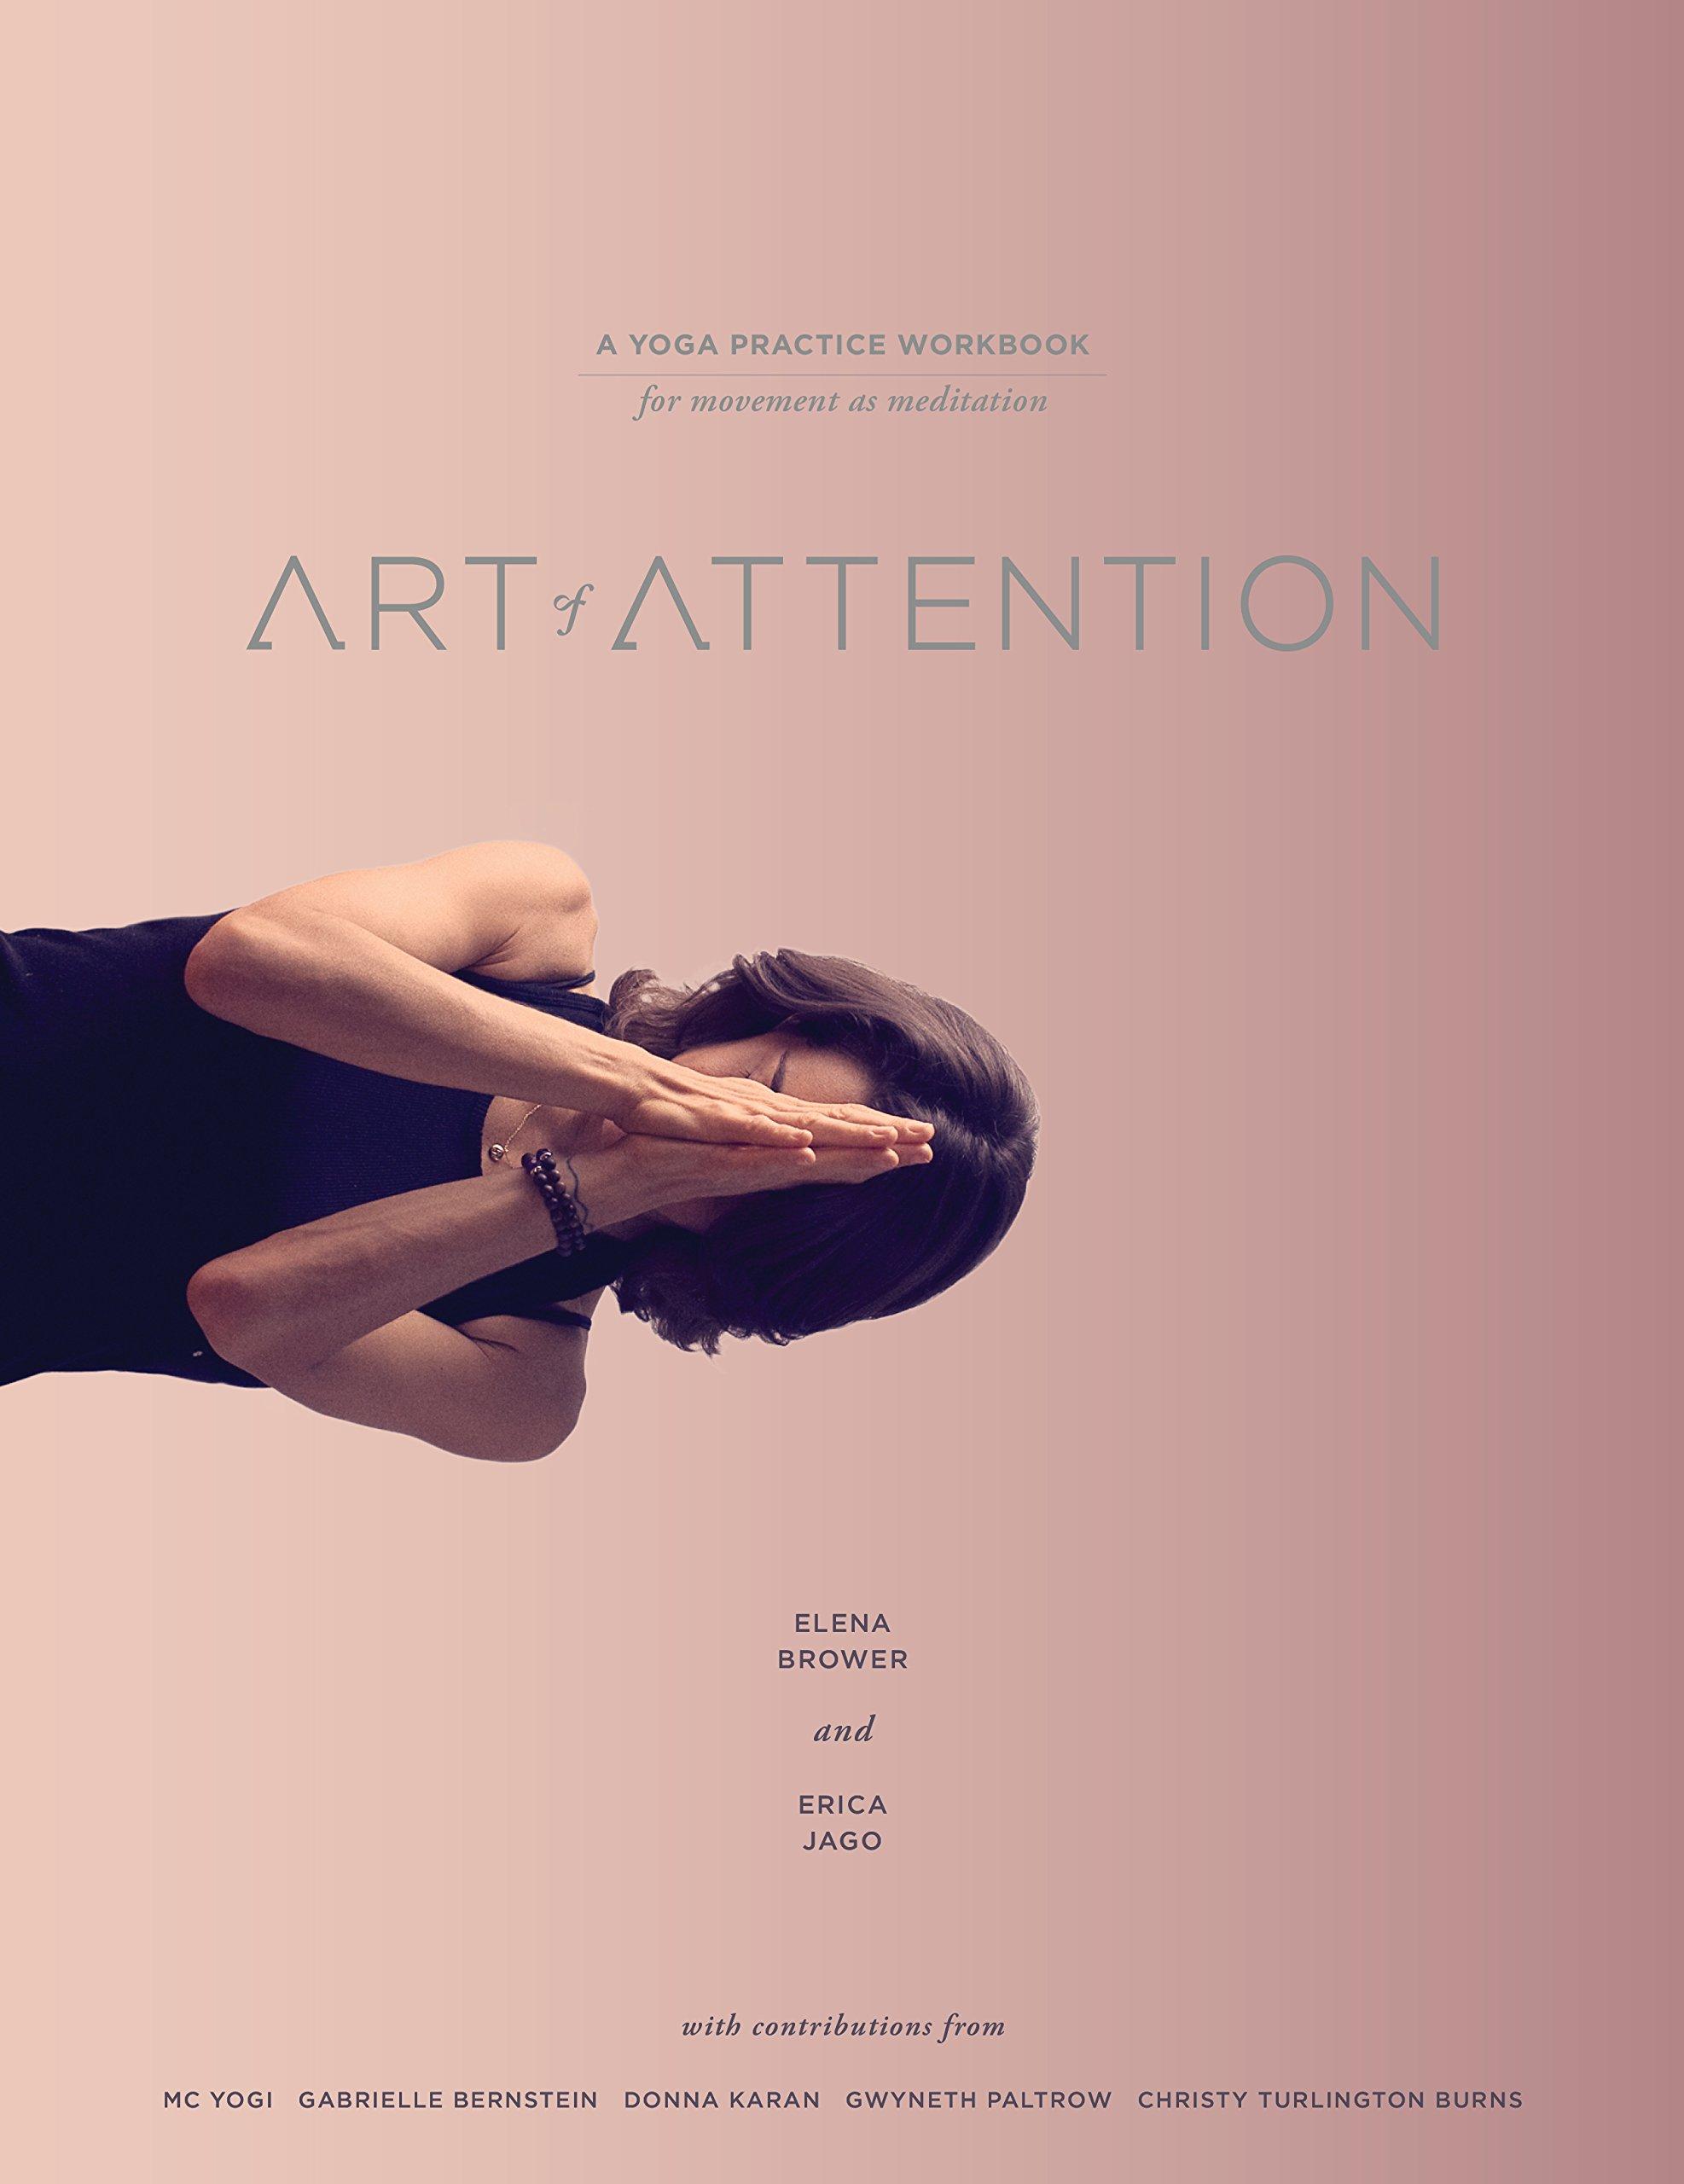 Art Attention Practice Workbook Meditation